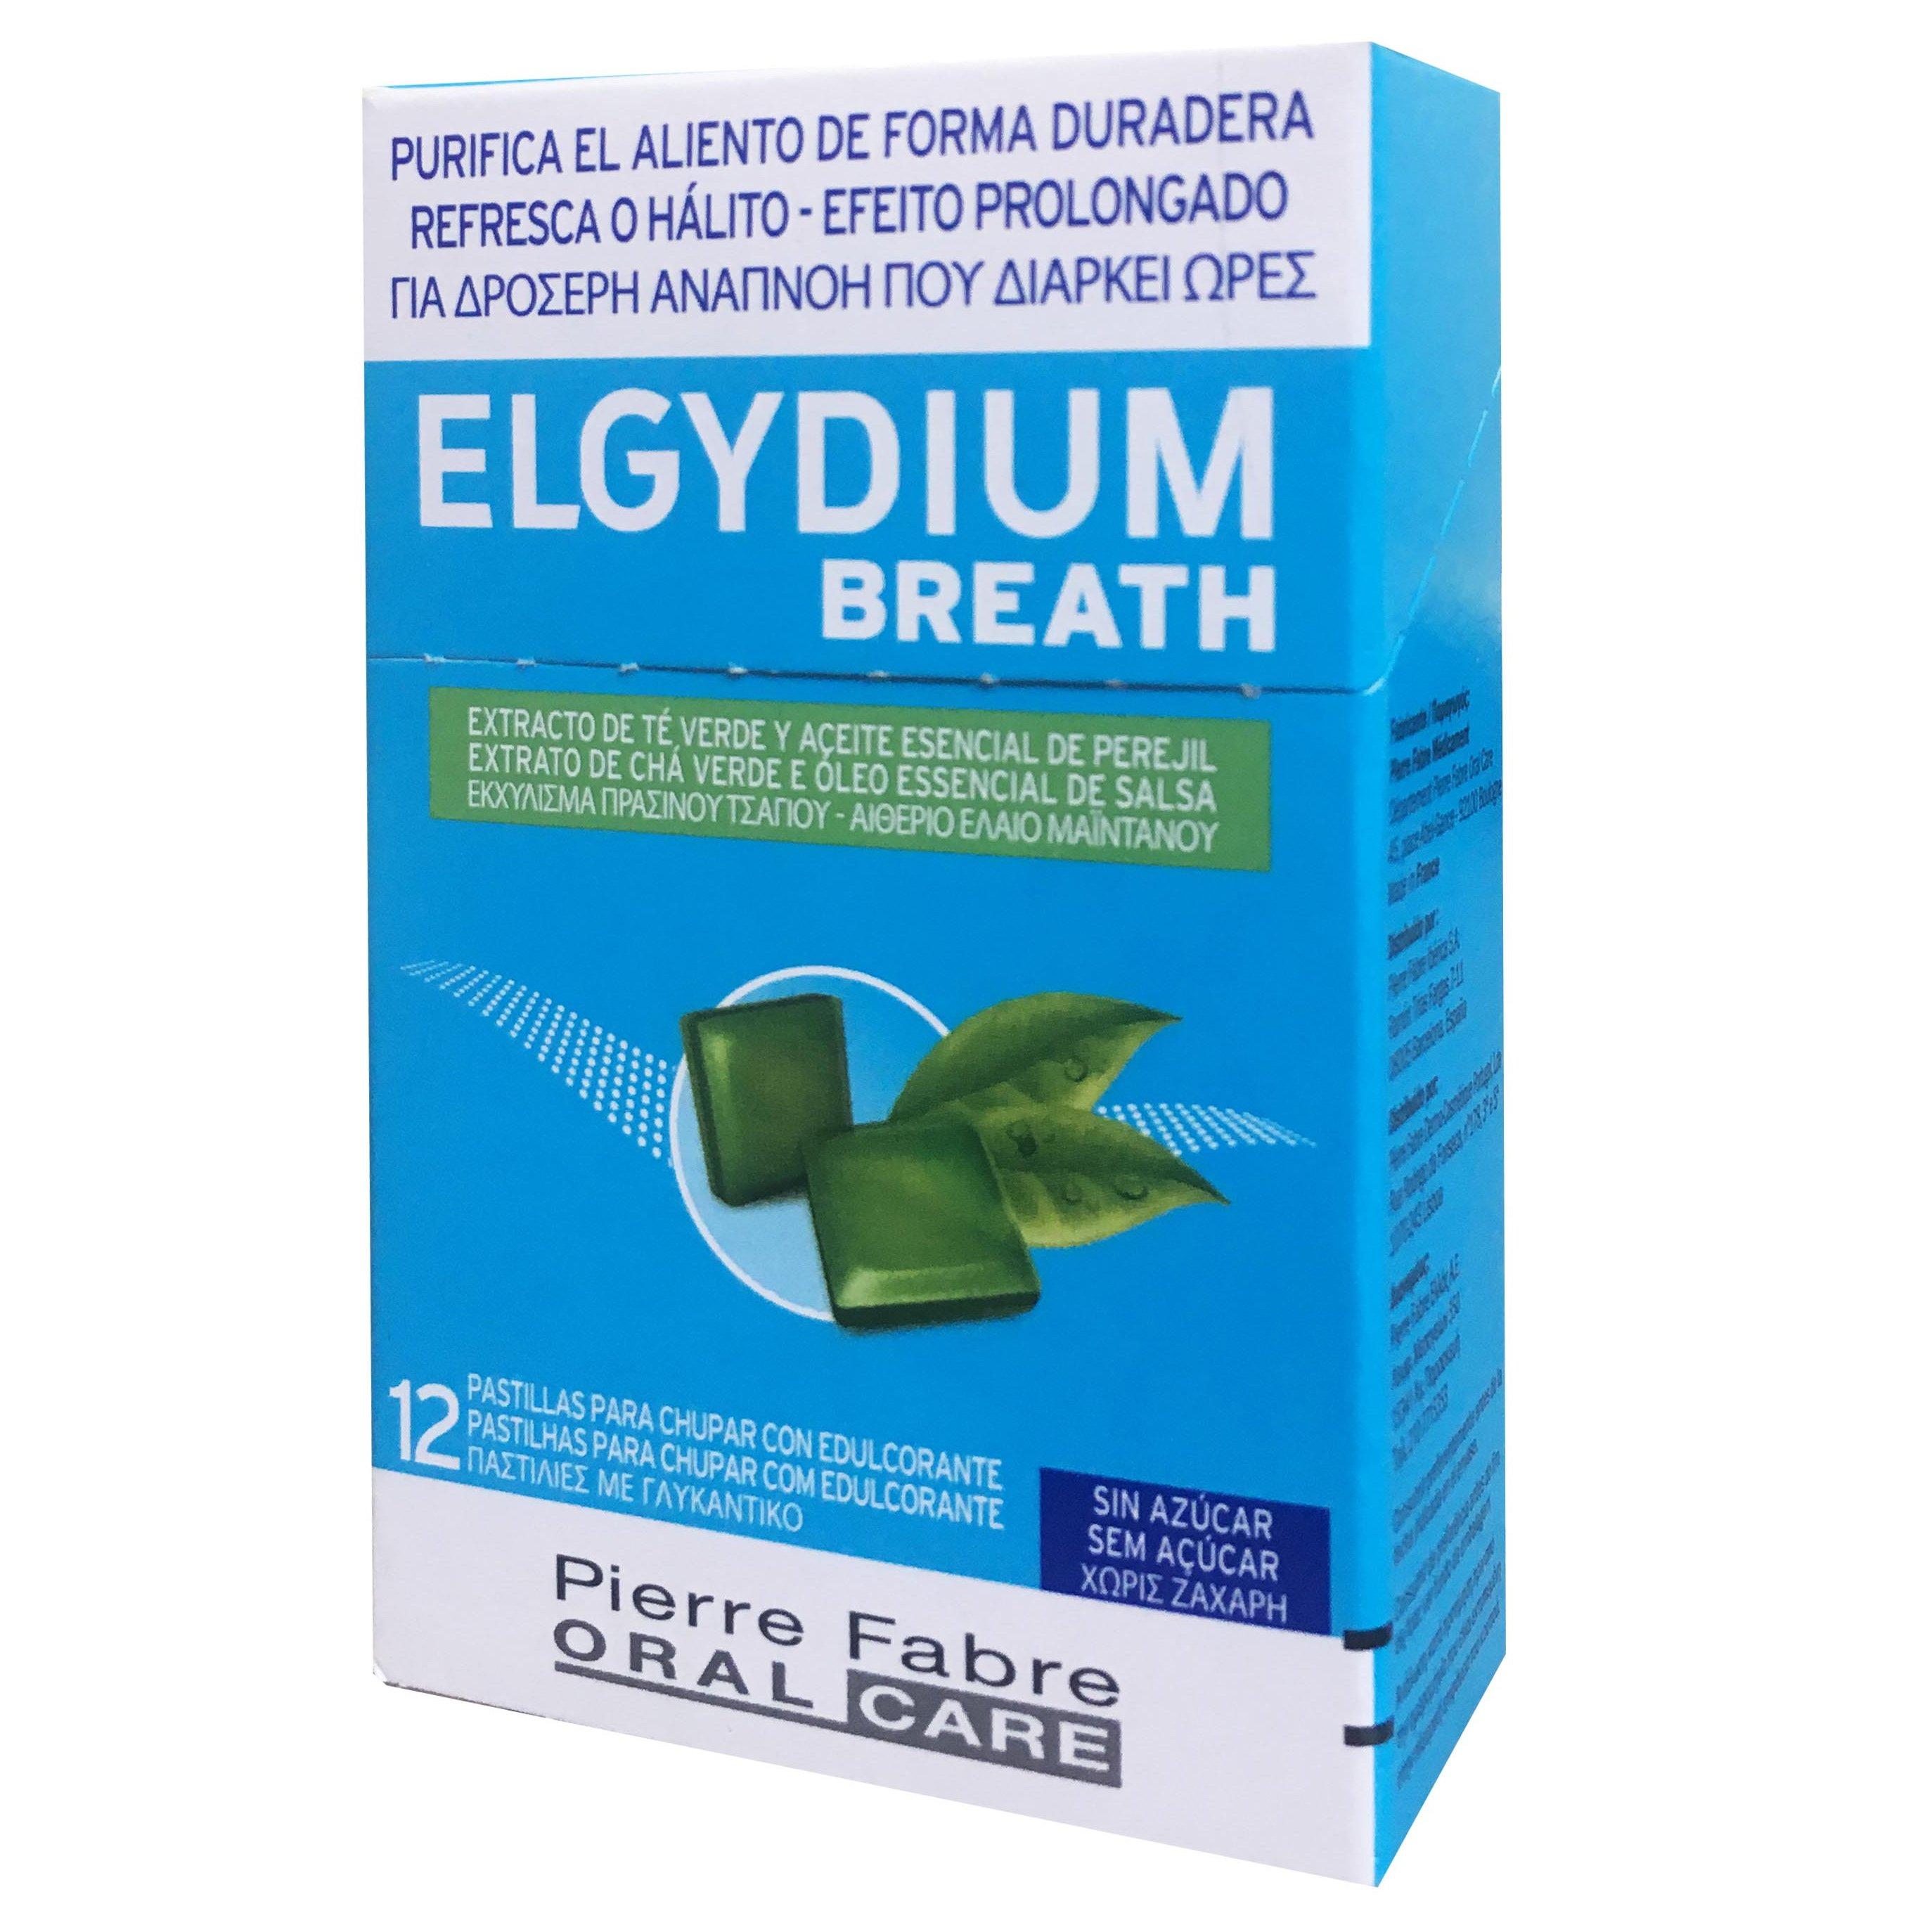 Elgydium Breath Pastilles Παστίλιες για την Εξουδετέρωση της Κακοσμίας του Στόματος 12 Τεμάχια